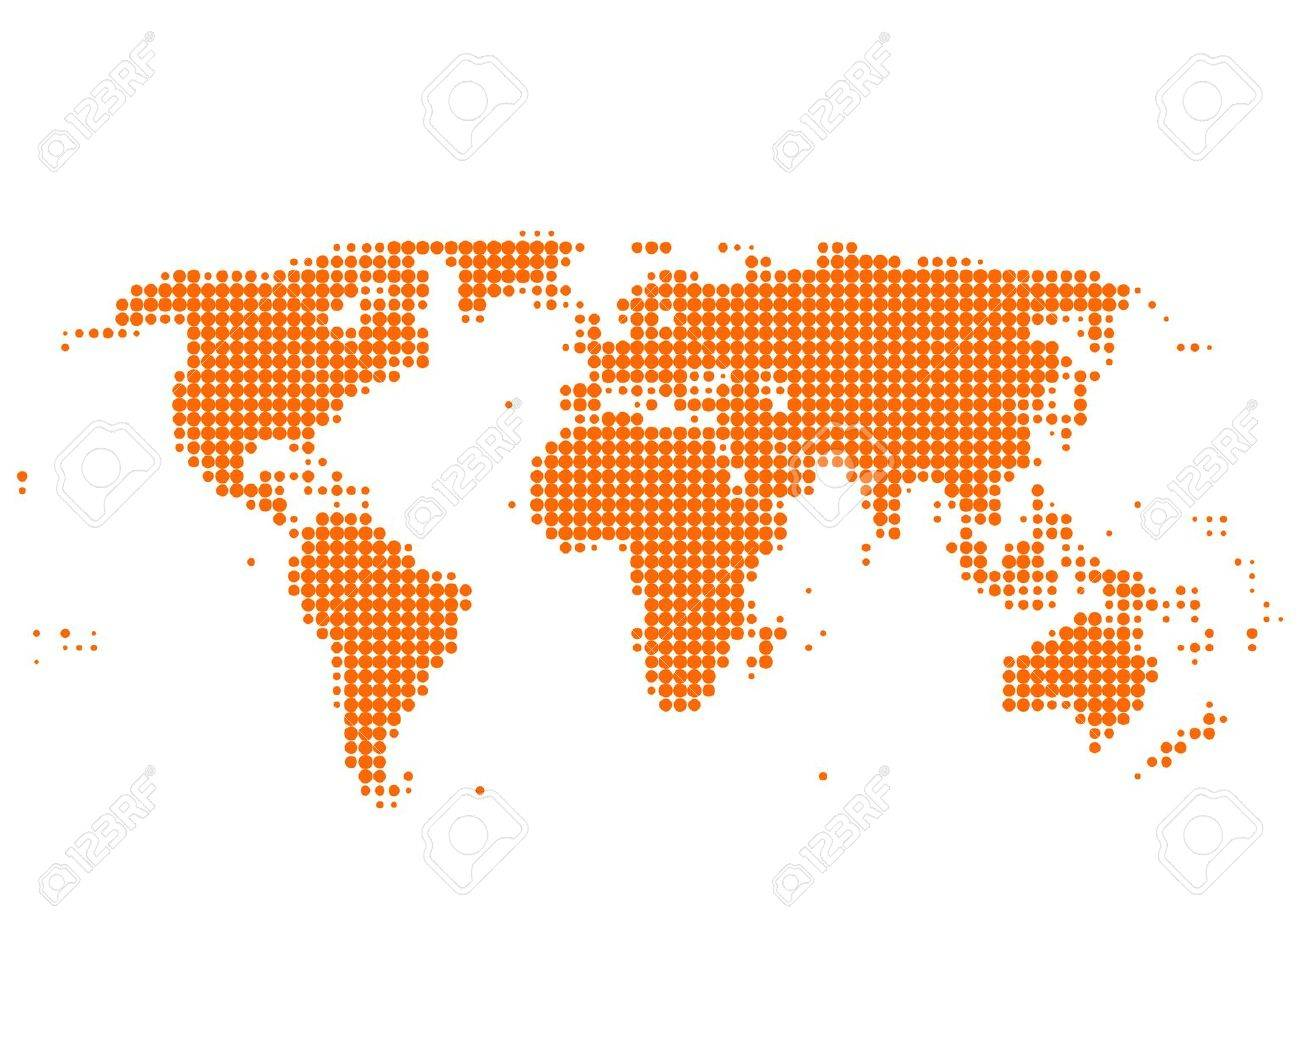 World map - 9073256